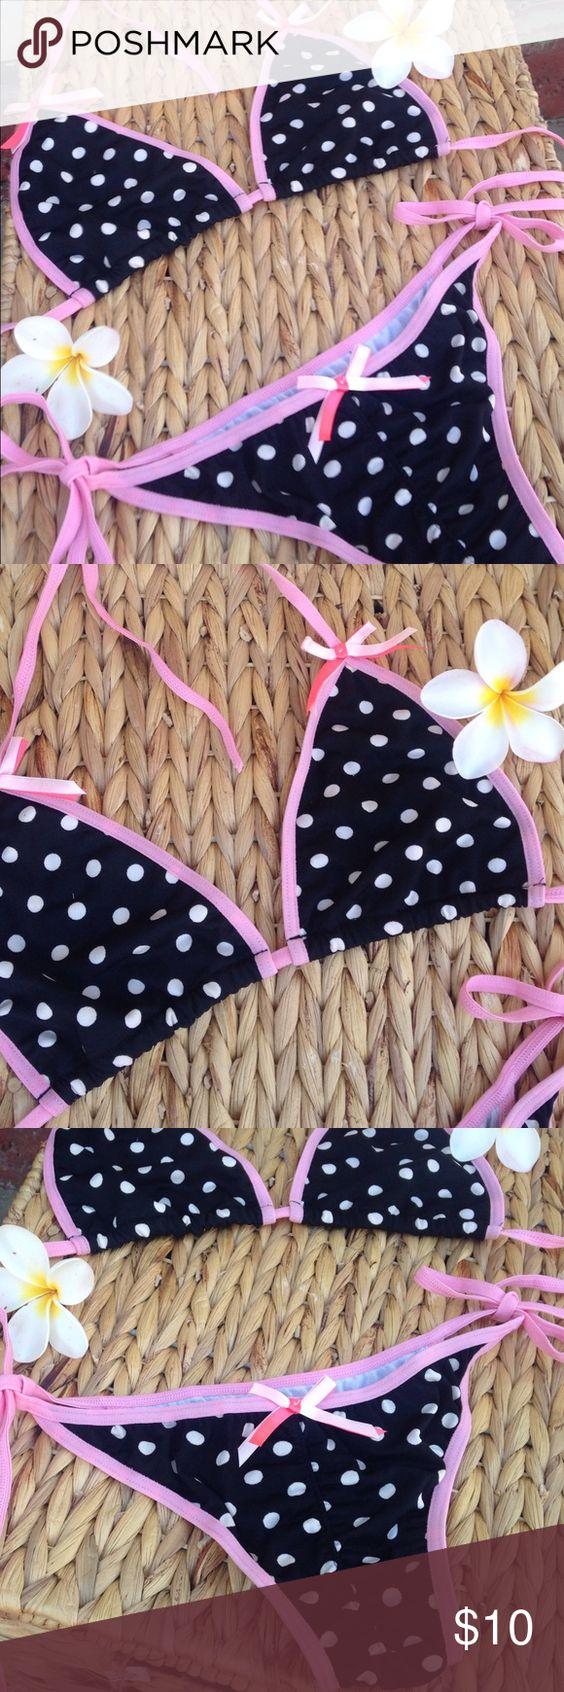 Polka Dot Triangle String Bikini Black/Pink Bows M Darling Pink/Black/White W/ Ties & Bows Polka Dot Bikini/ Stand Out Color Scheme.... New In Bag. Swim Bikinis